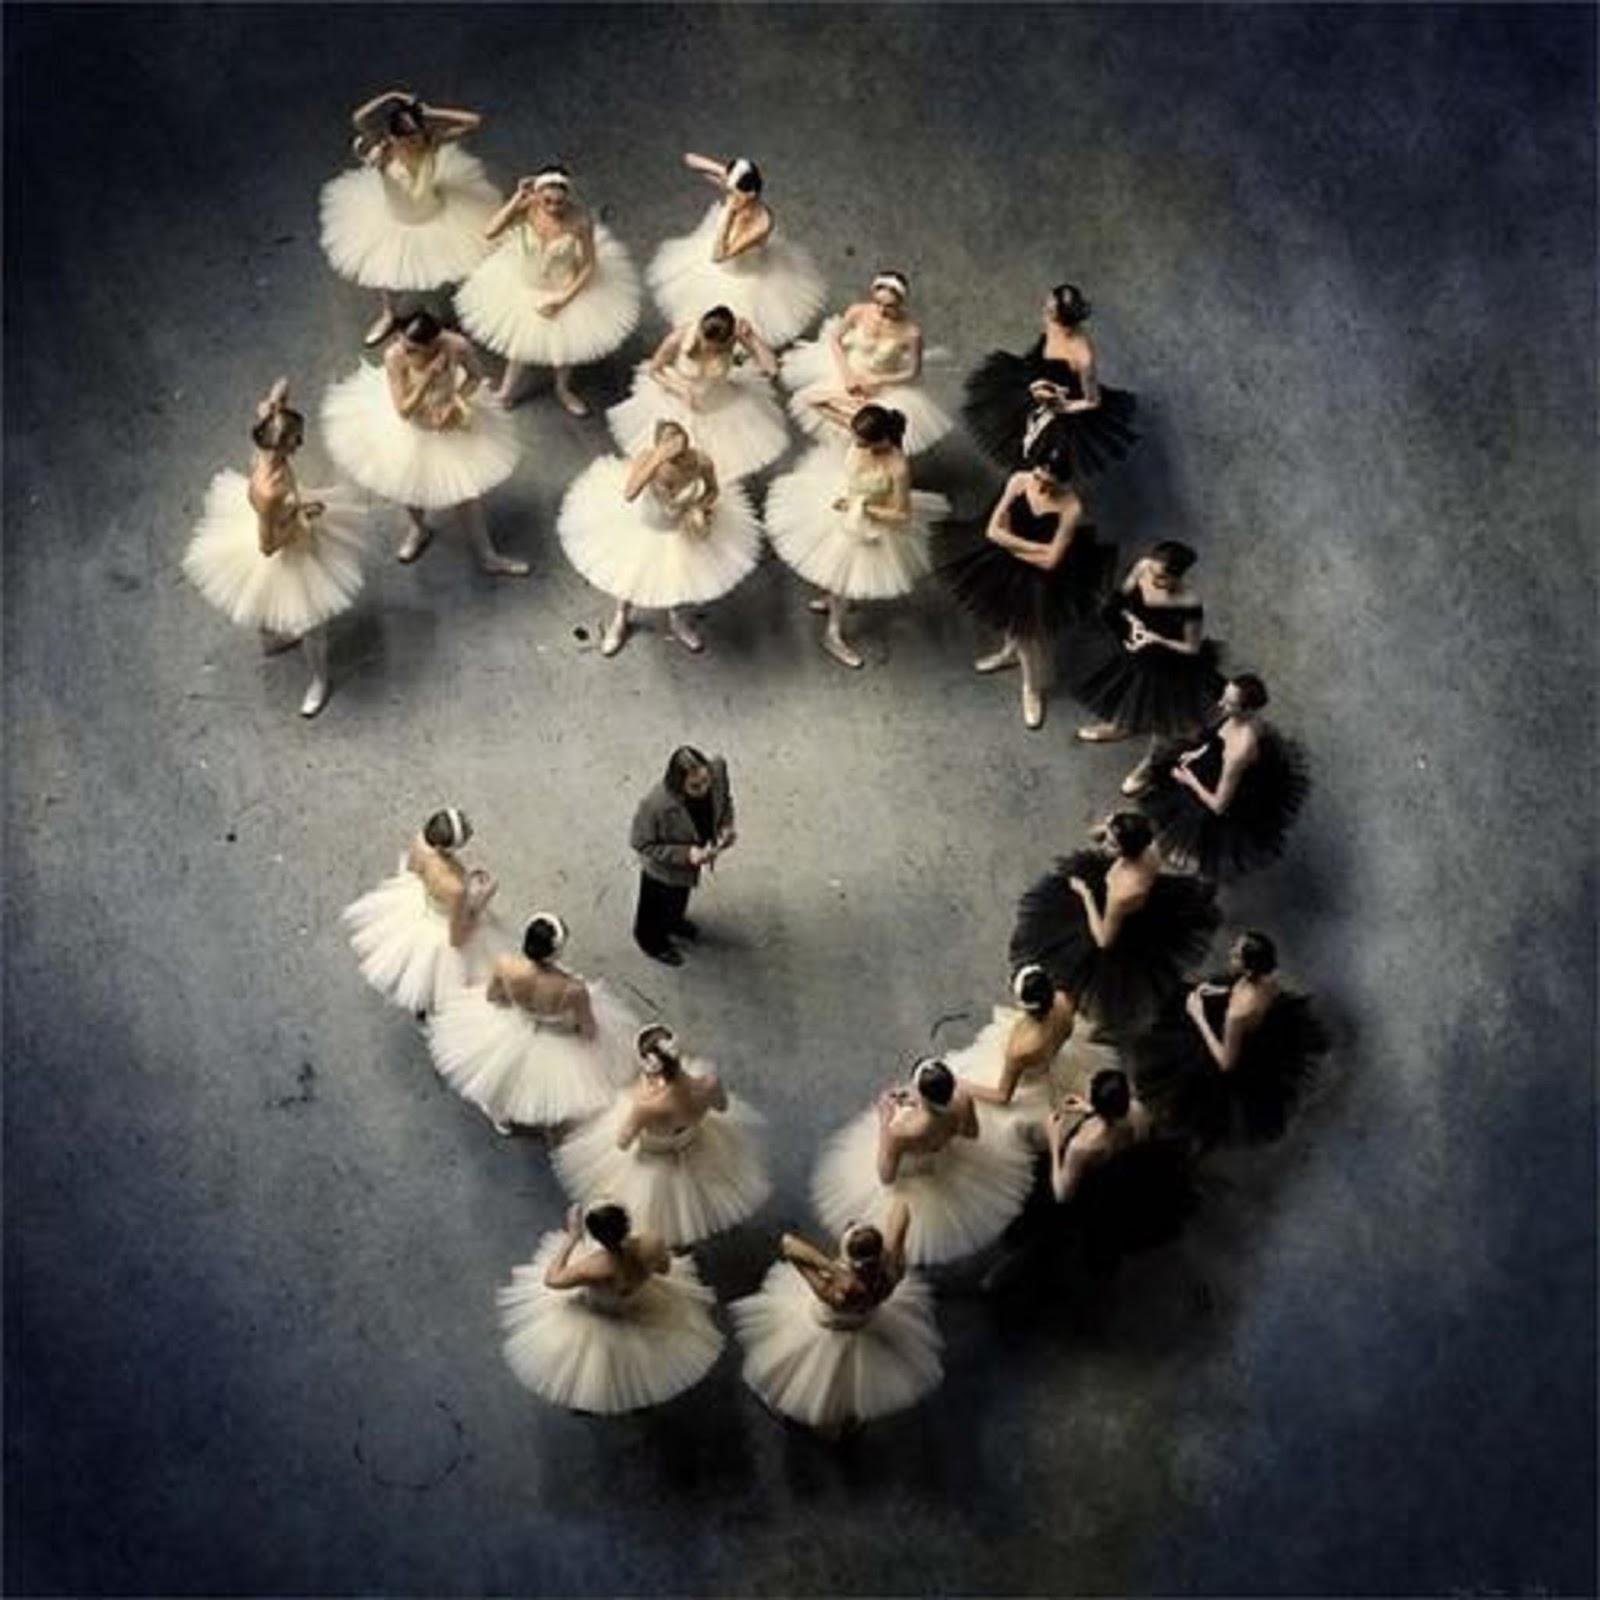 Noel Streatfeilds Ballet Shoes Is Released on DVD - The New York Times